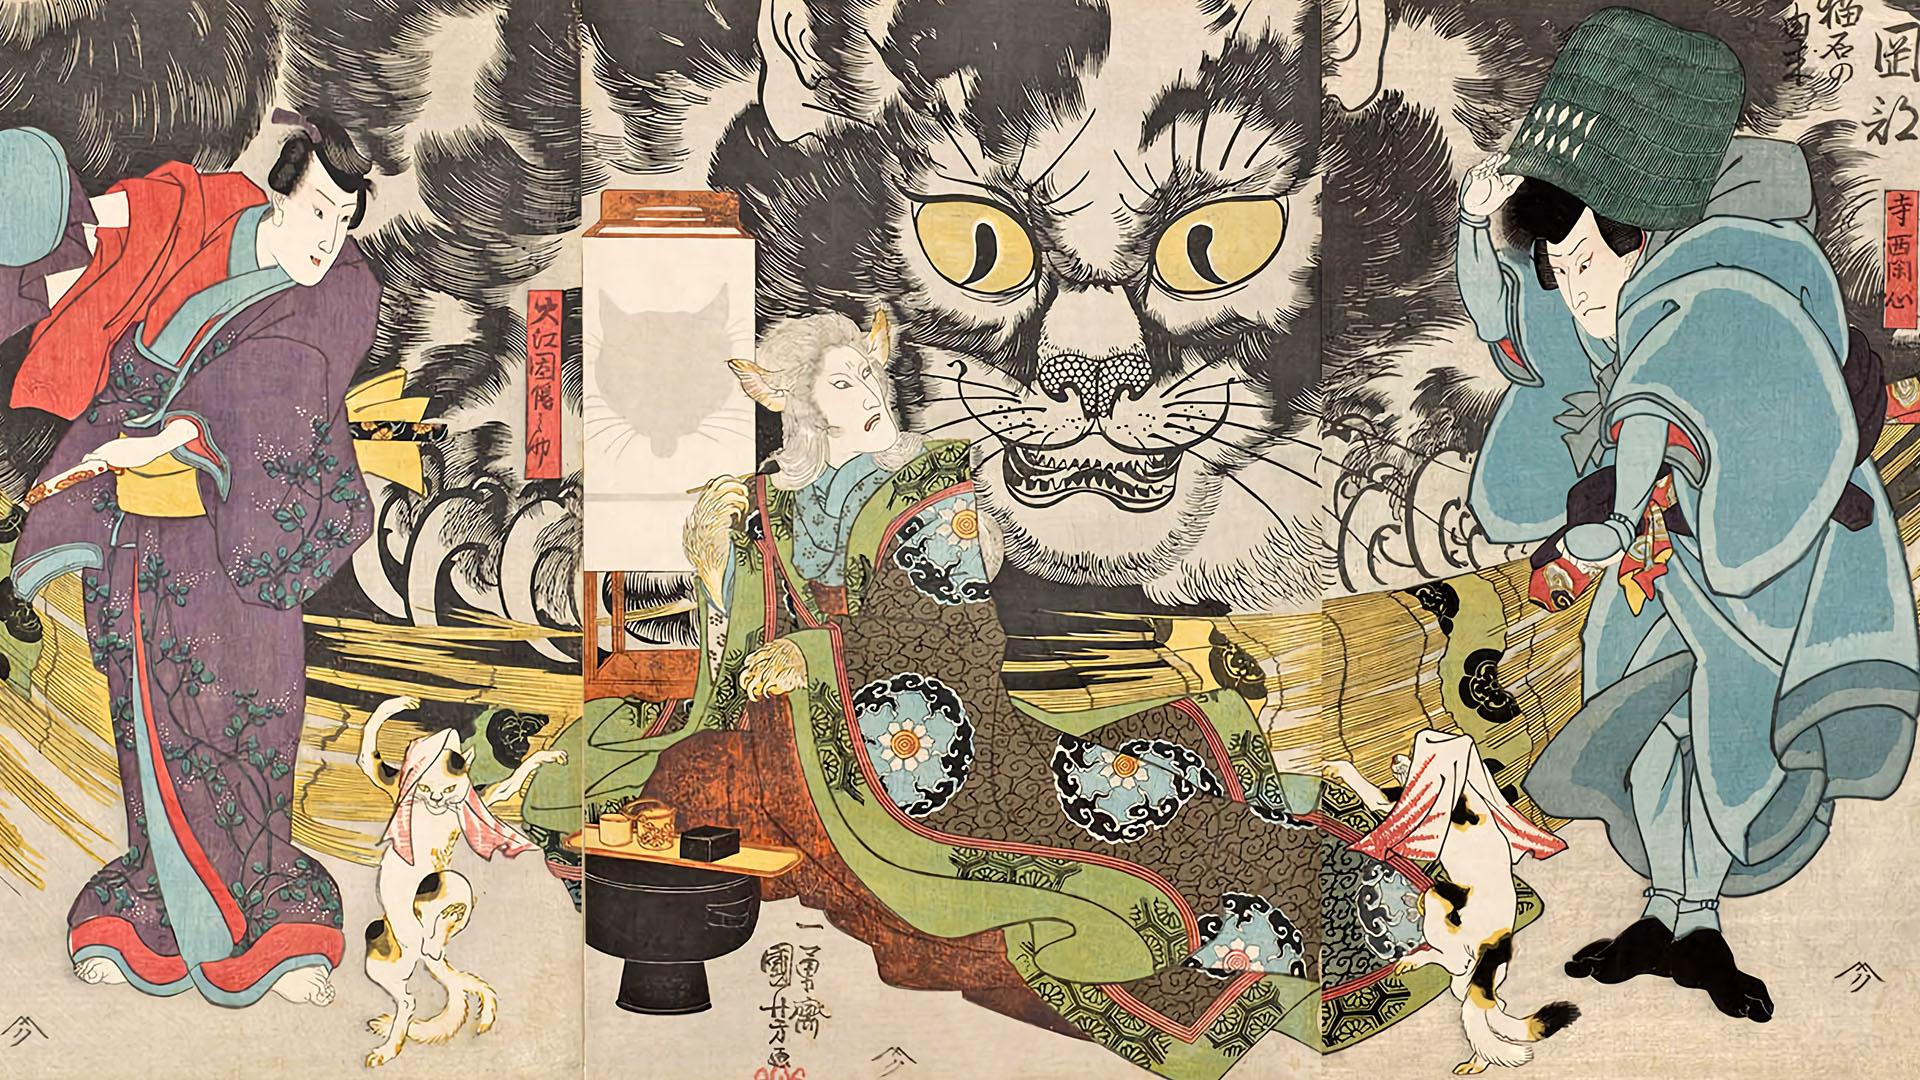 歌川国芳 Utagawa Kuniyoshi - Nekoishi no yurai 1920x1080